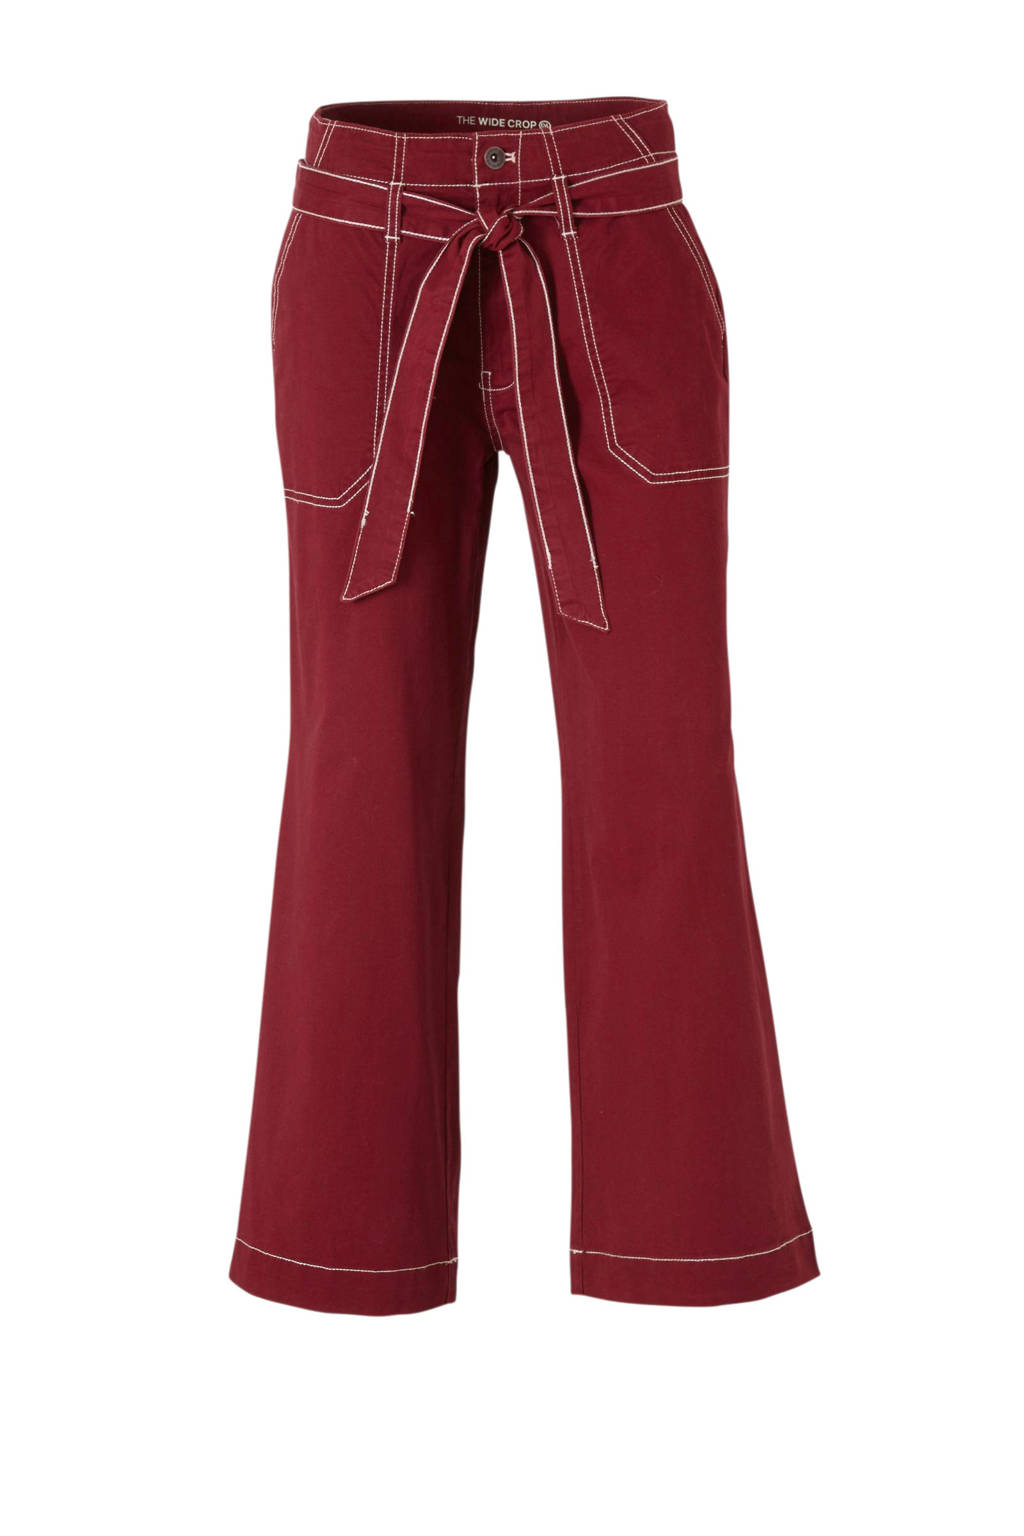 C&A Yessica high waist culotte donkerrood, Donkerrood